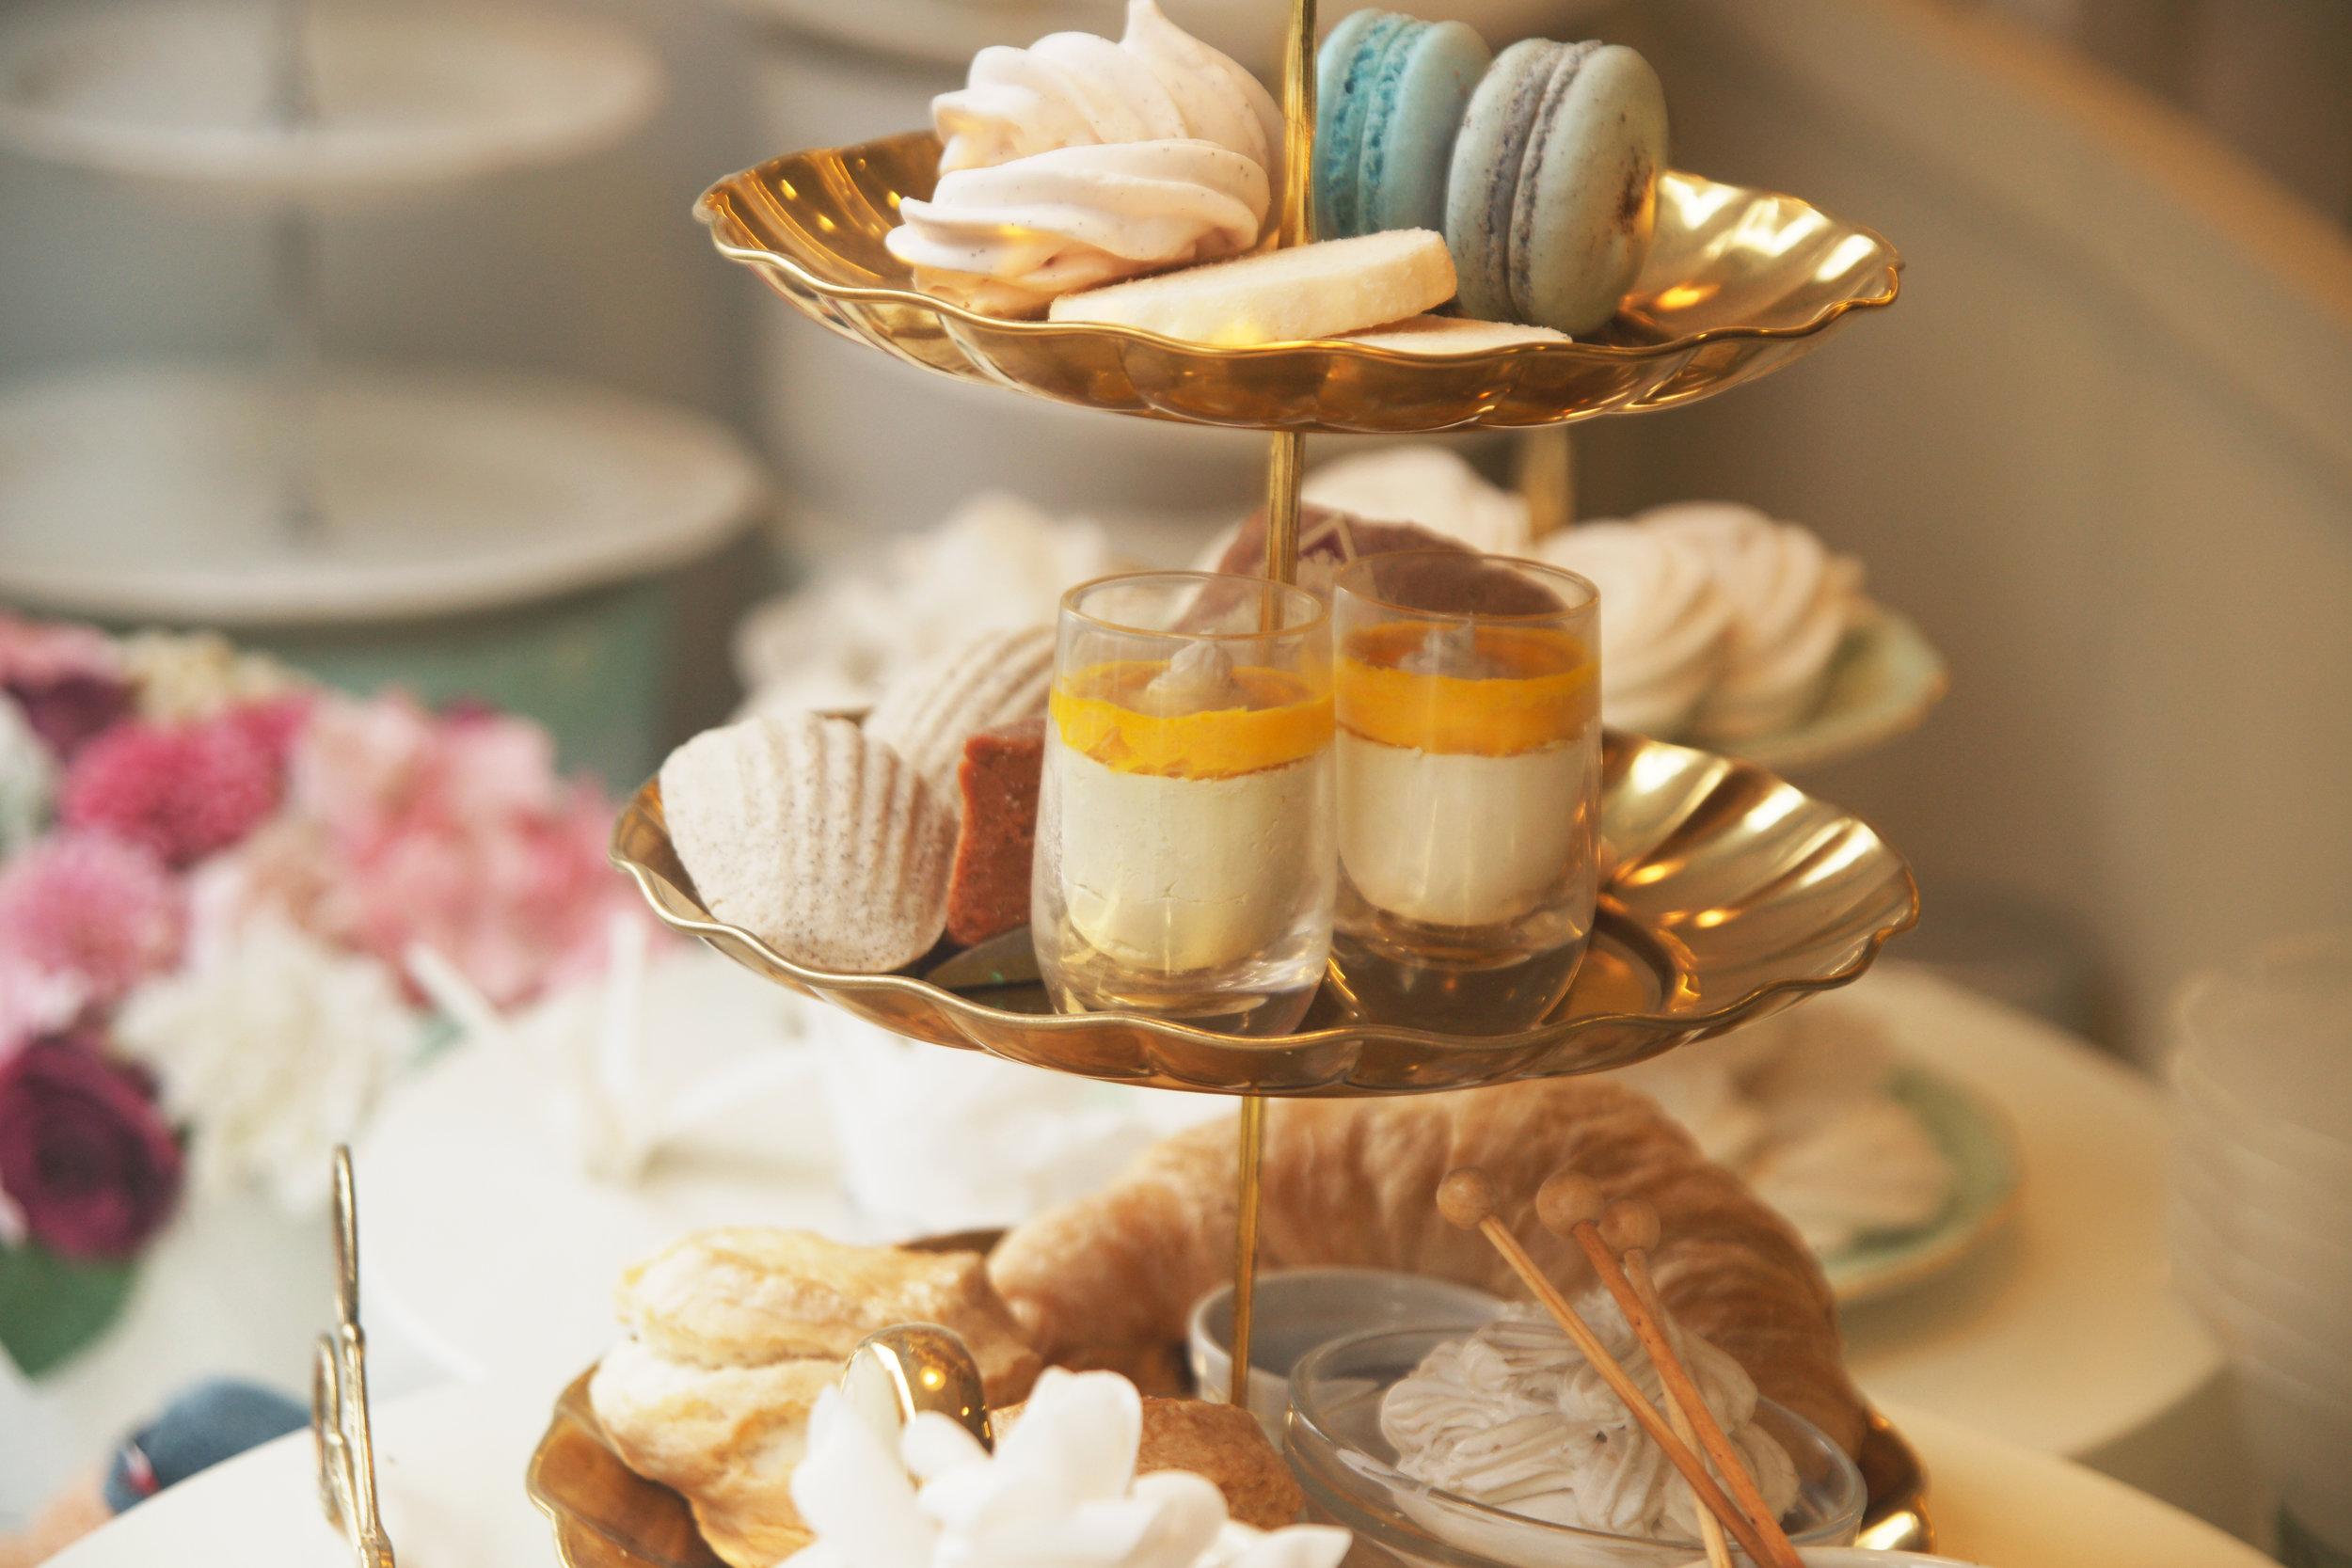 Tea party ideas #teaparty #aliceinwonderlandparty #afternoontea #bridalshower